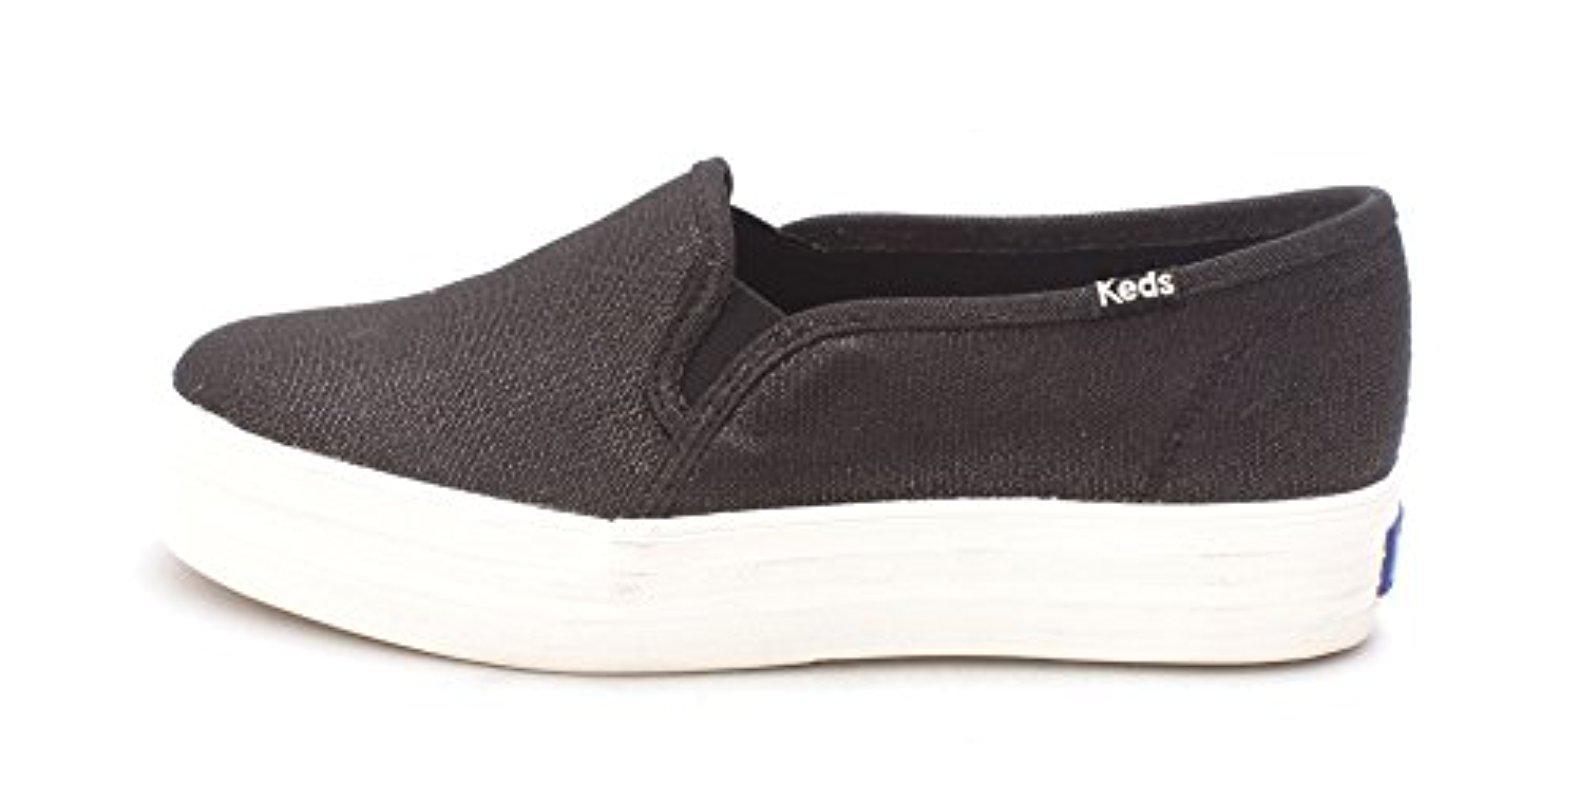 Keds. Women's Black Triple Decker Metallic Canvas Fashion Sneaker